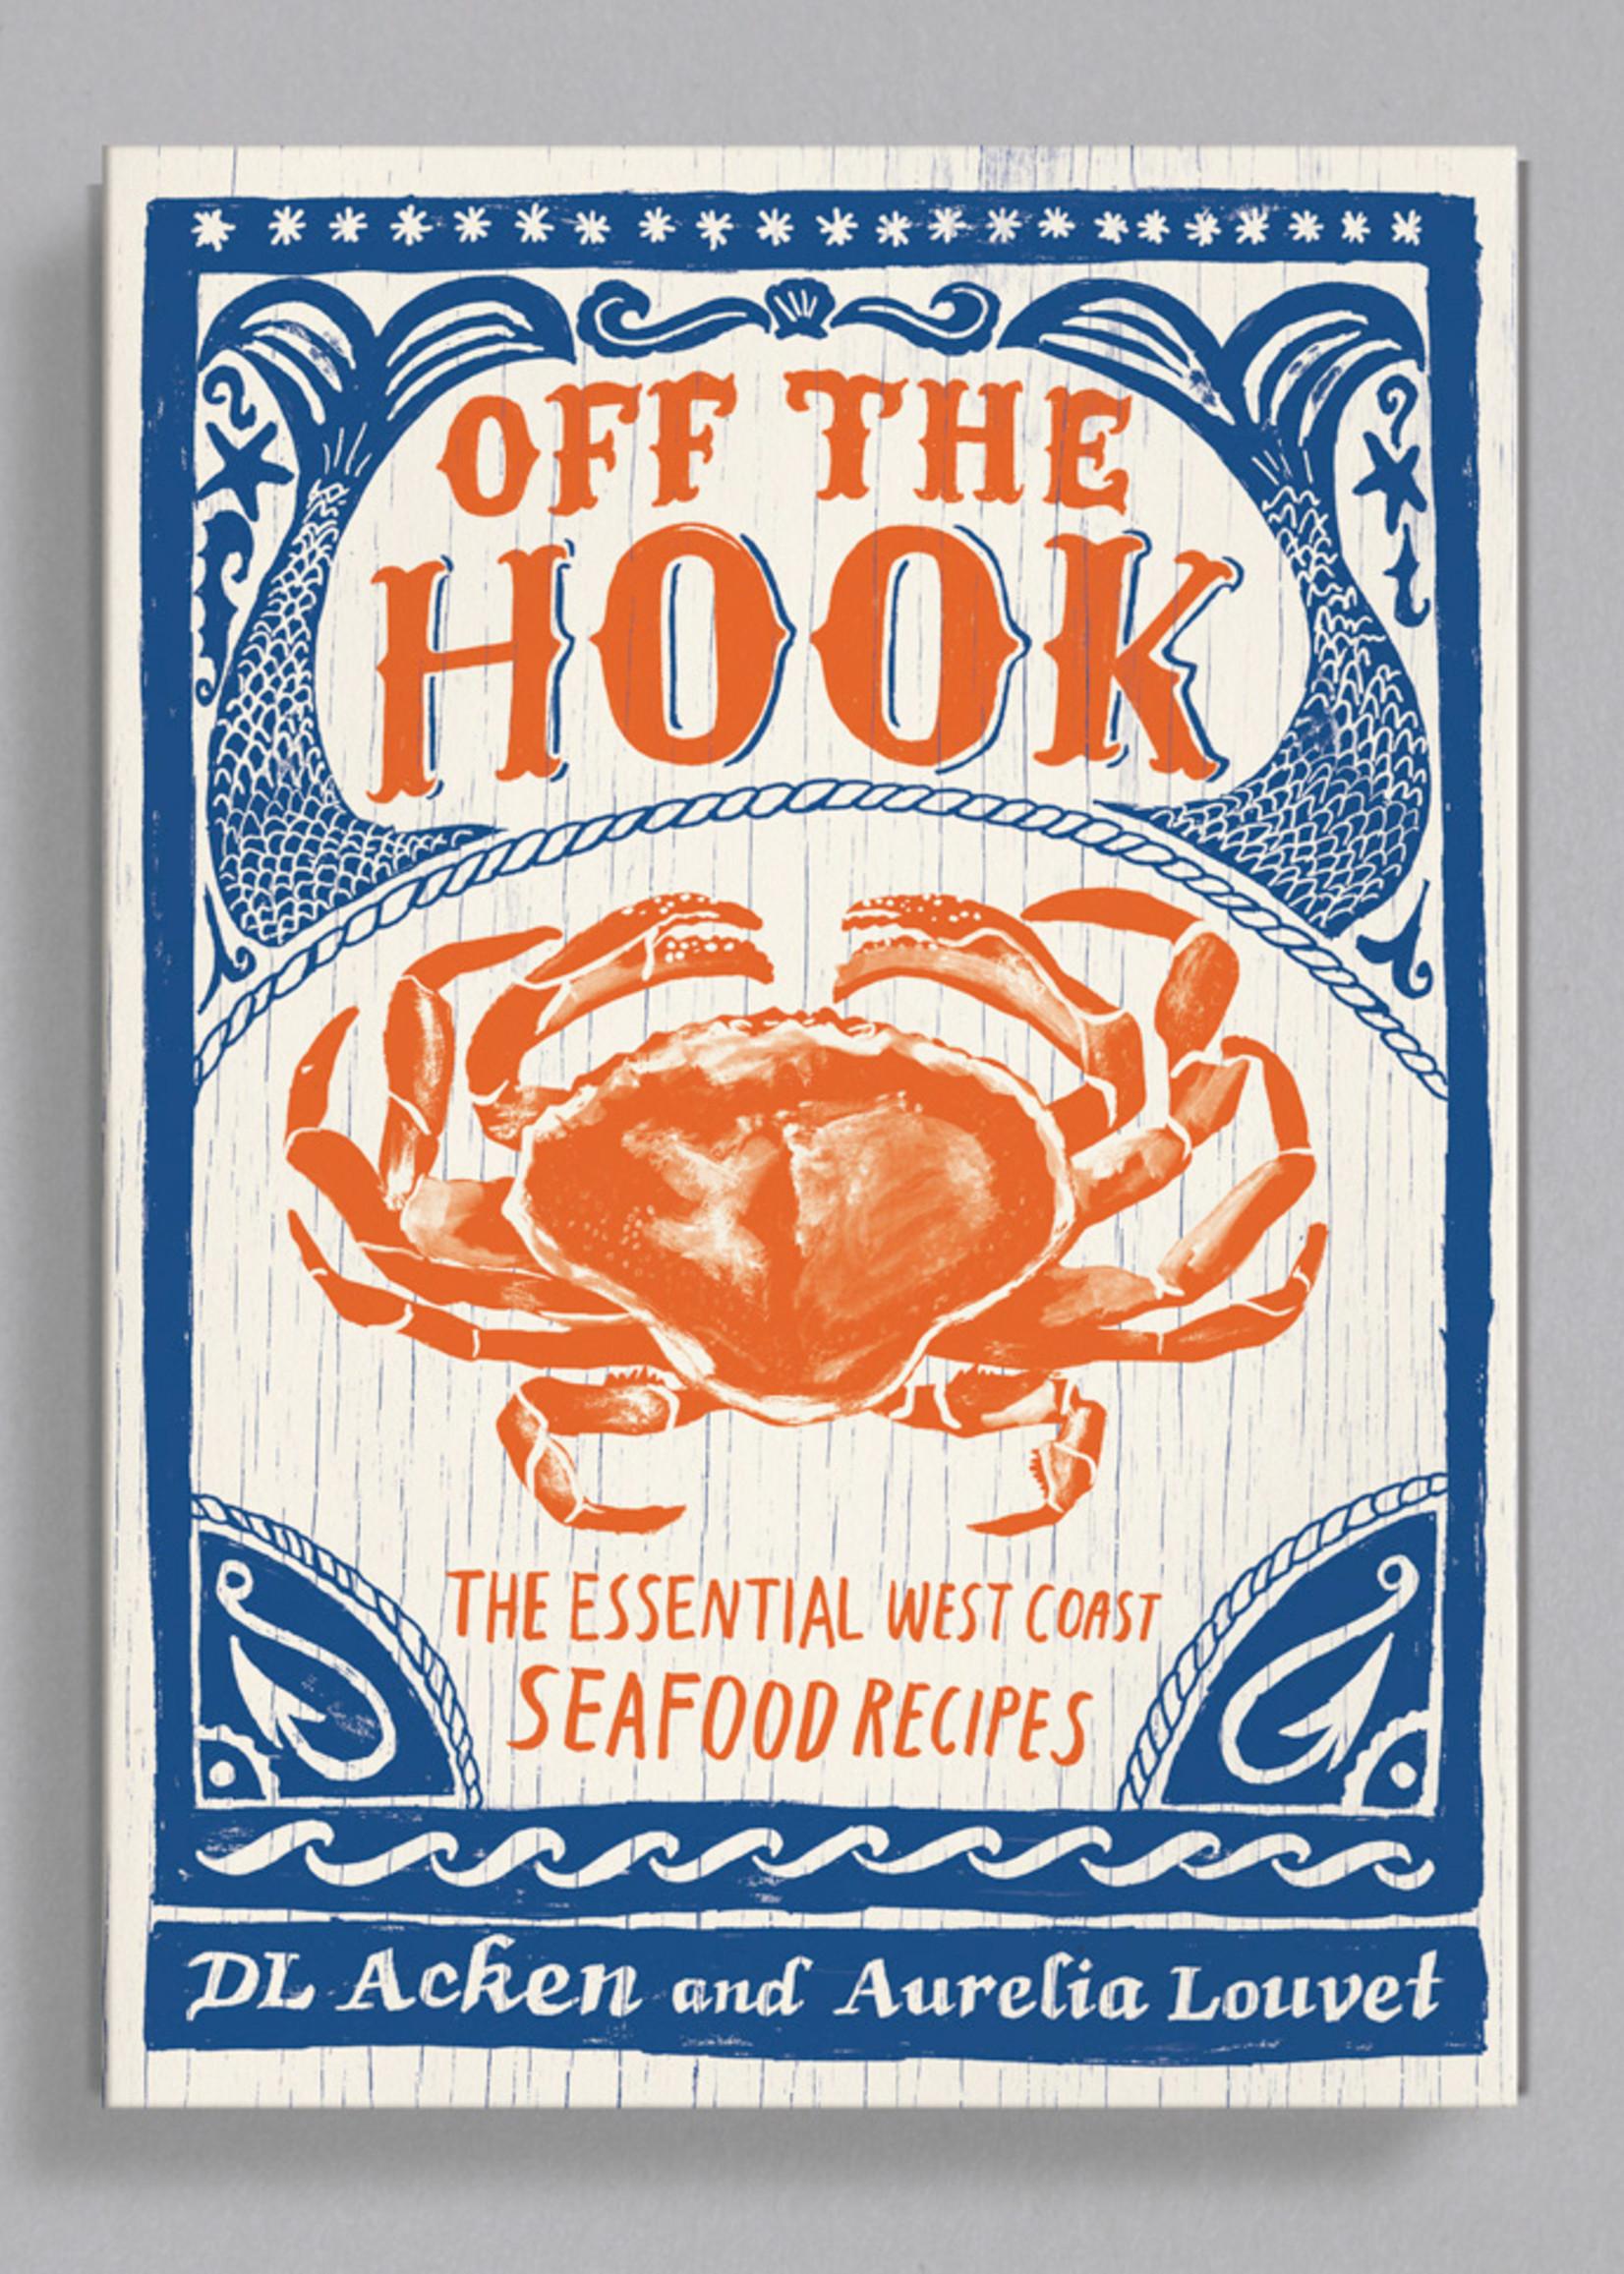 DL Acken DL Acken - Off The Hook Cookbook